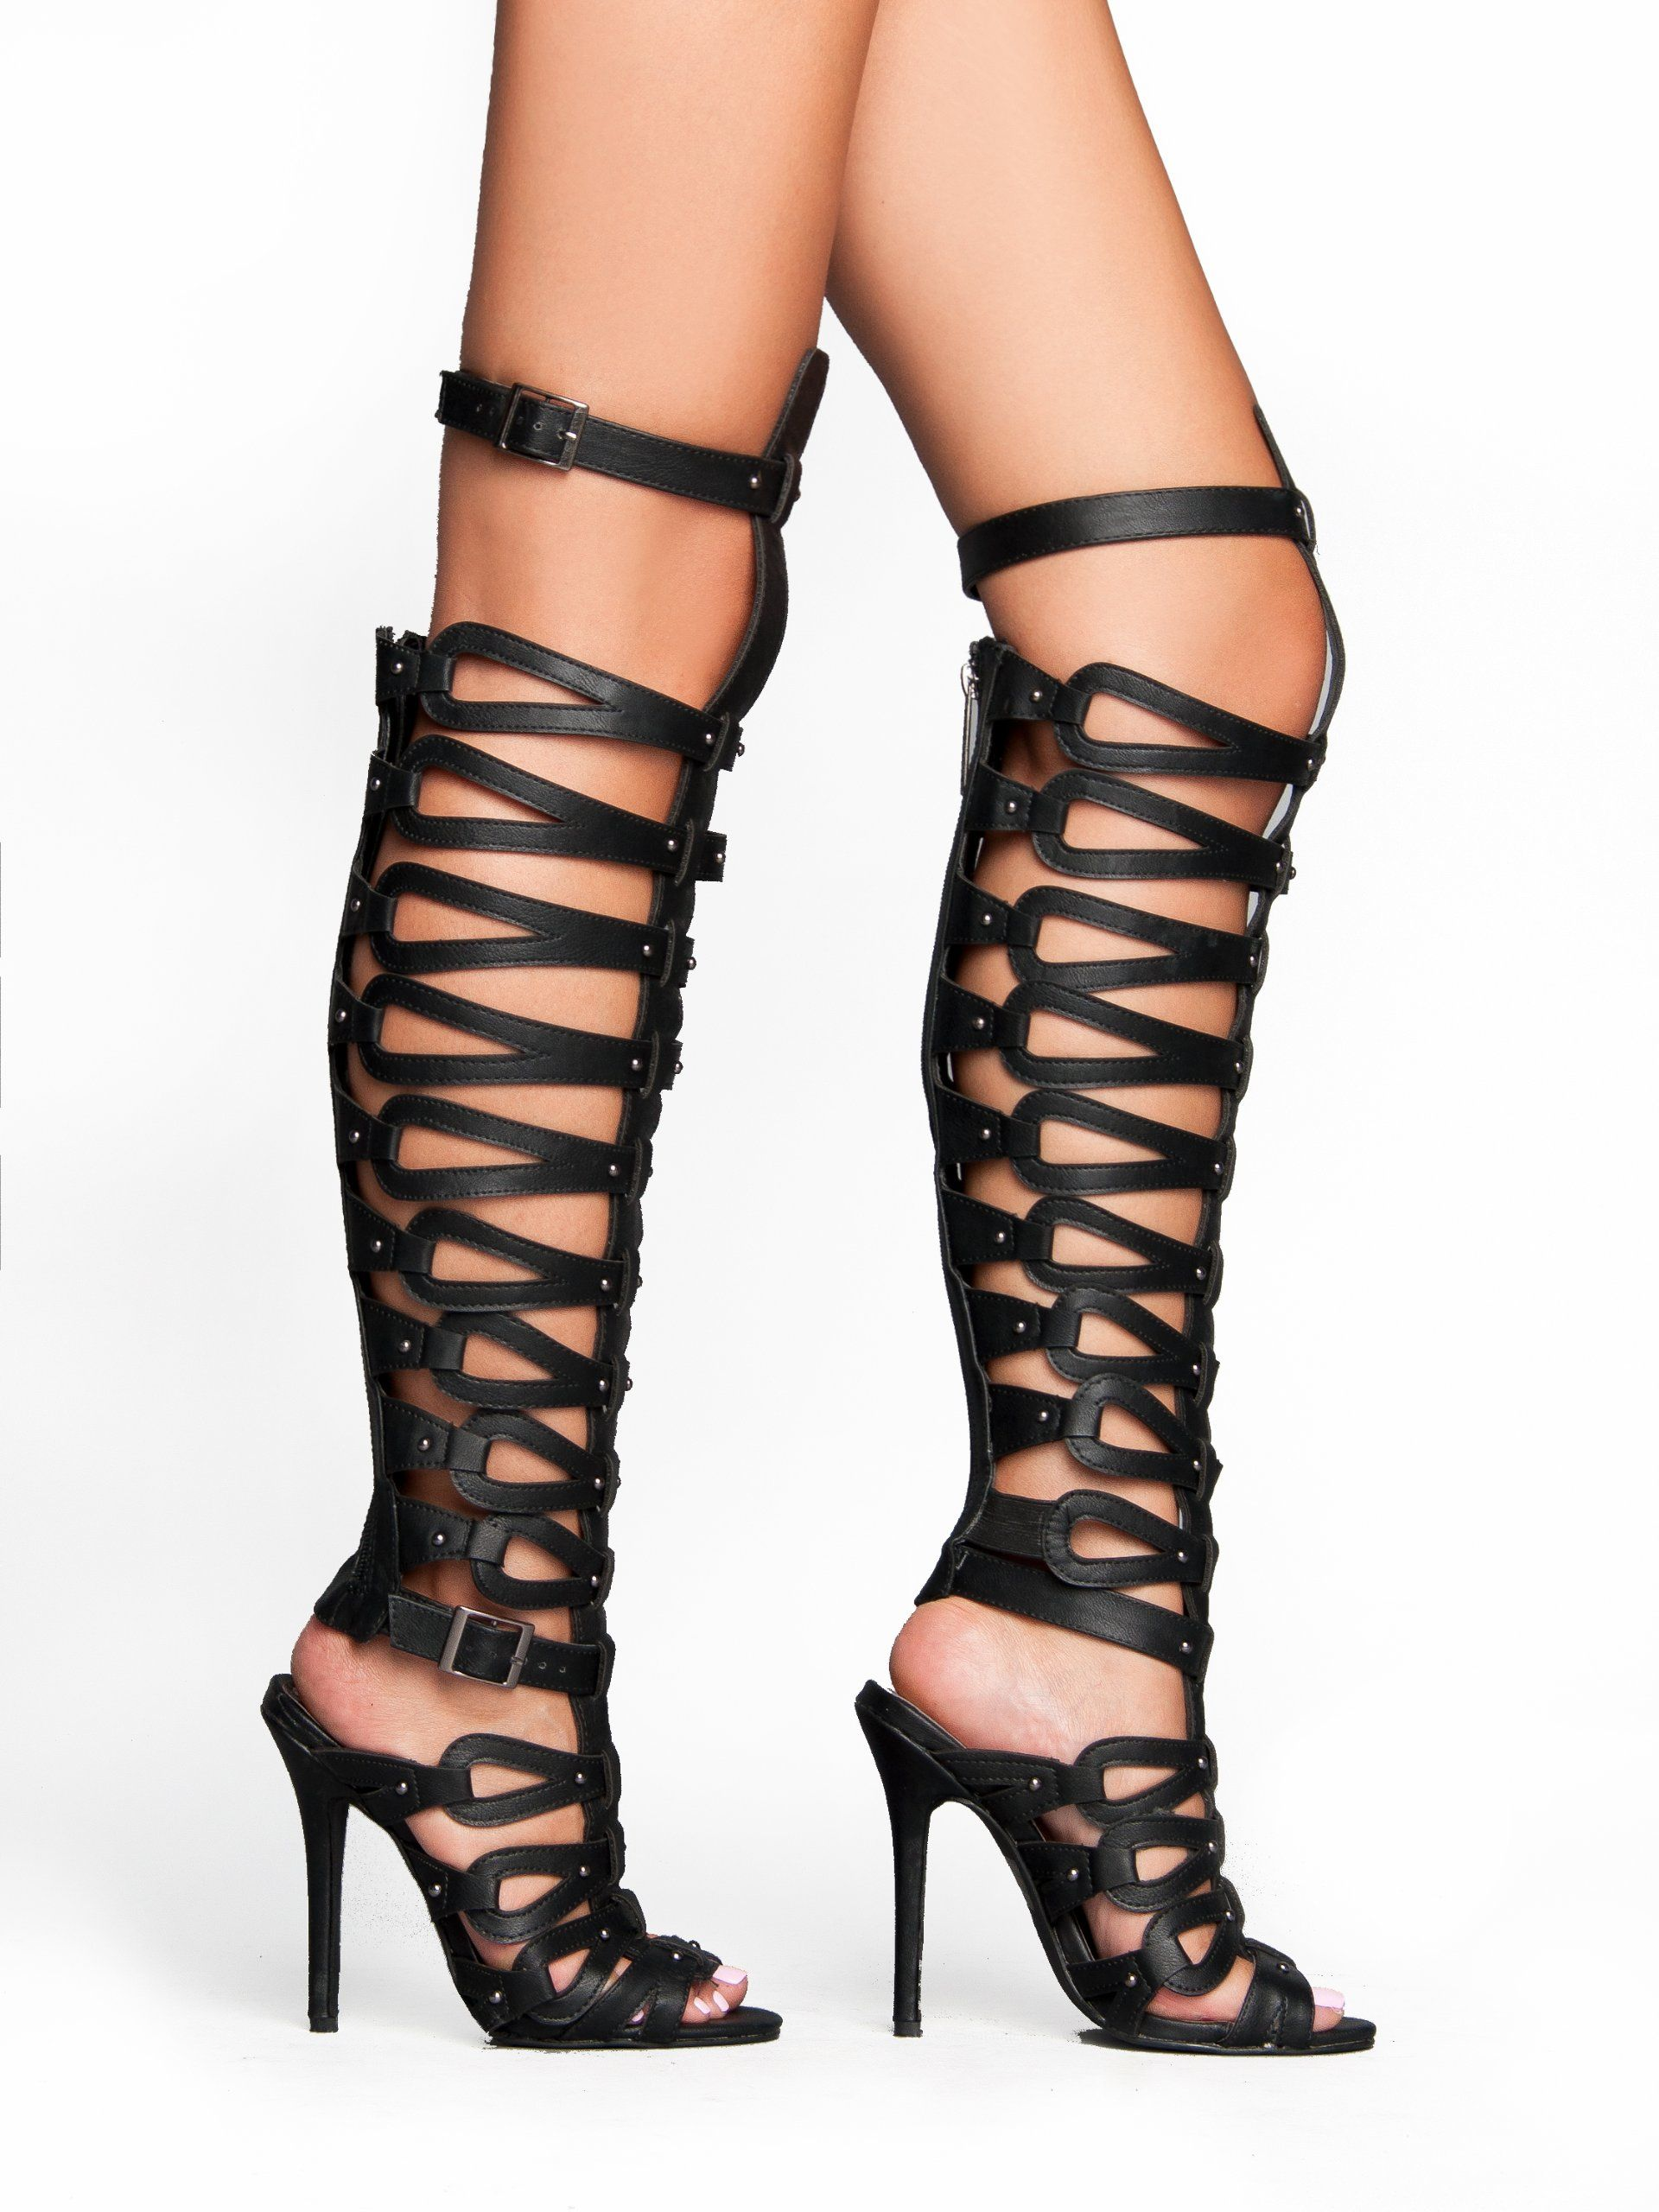 Breckelle Diva-31 Strappy Studded Gladiator Knee High Heel